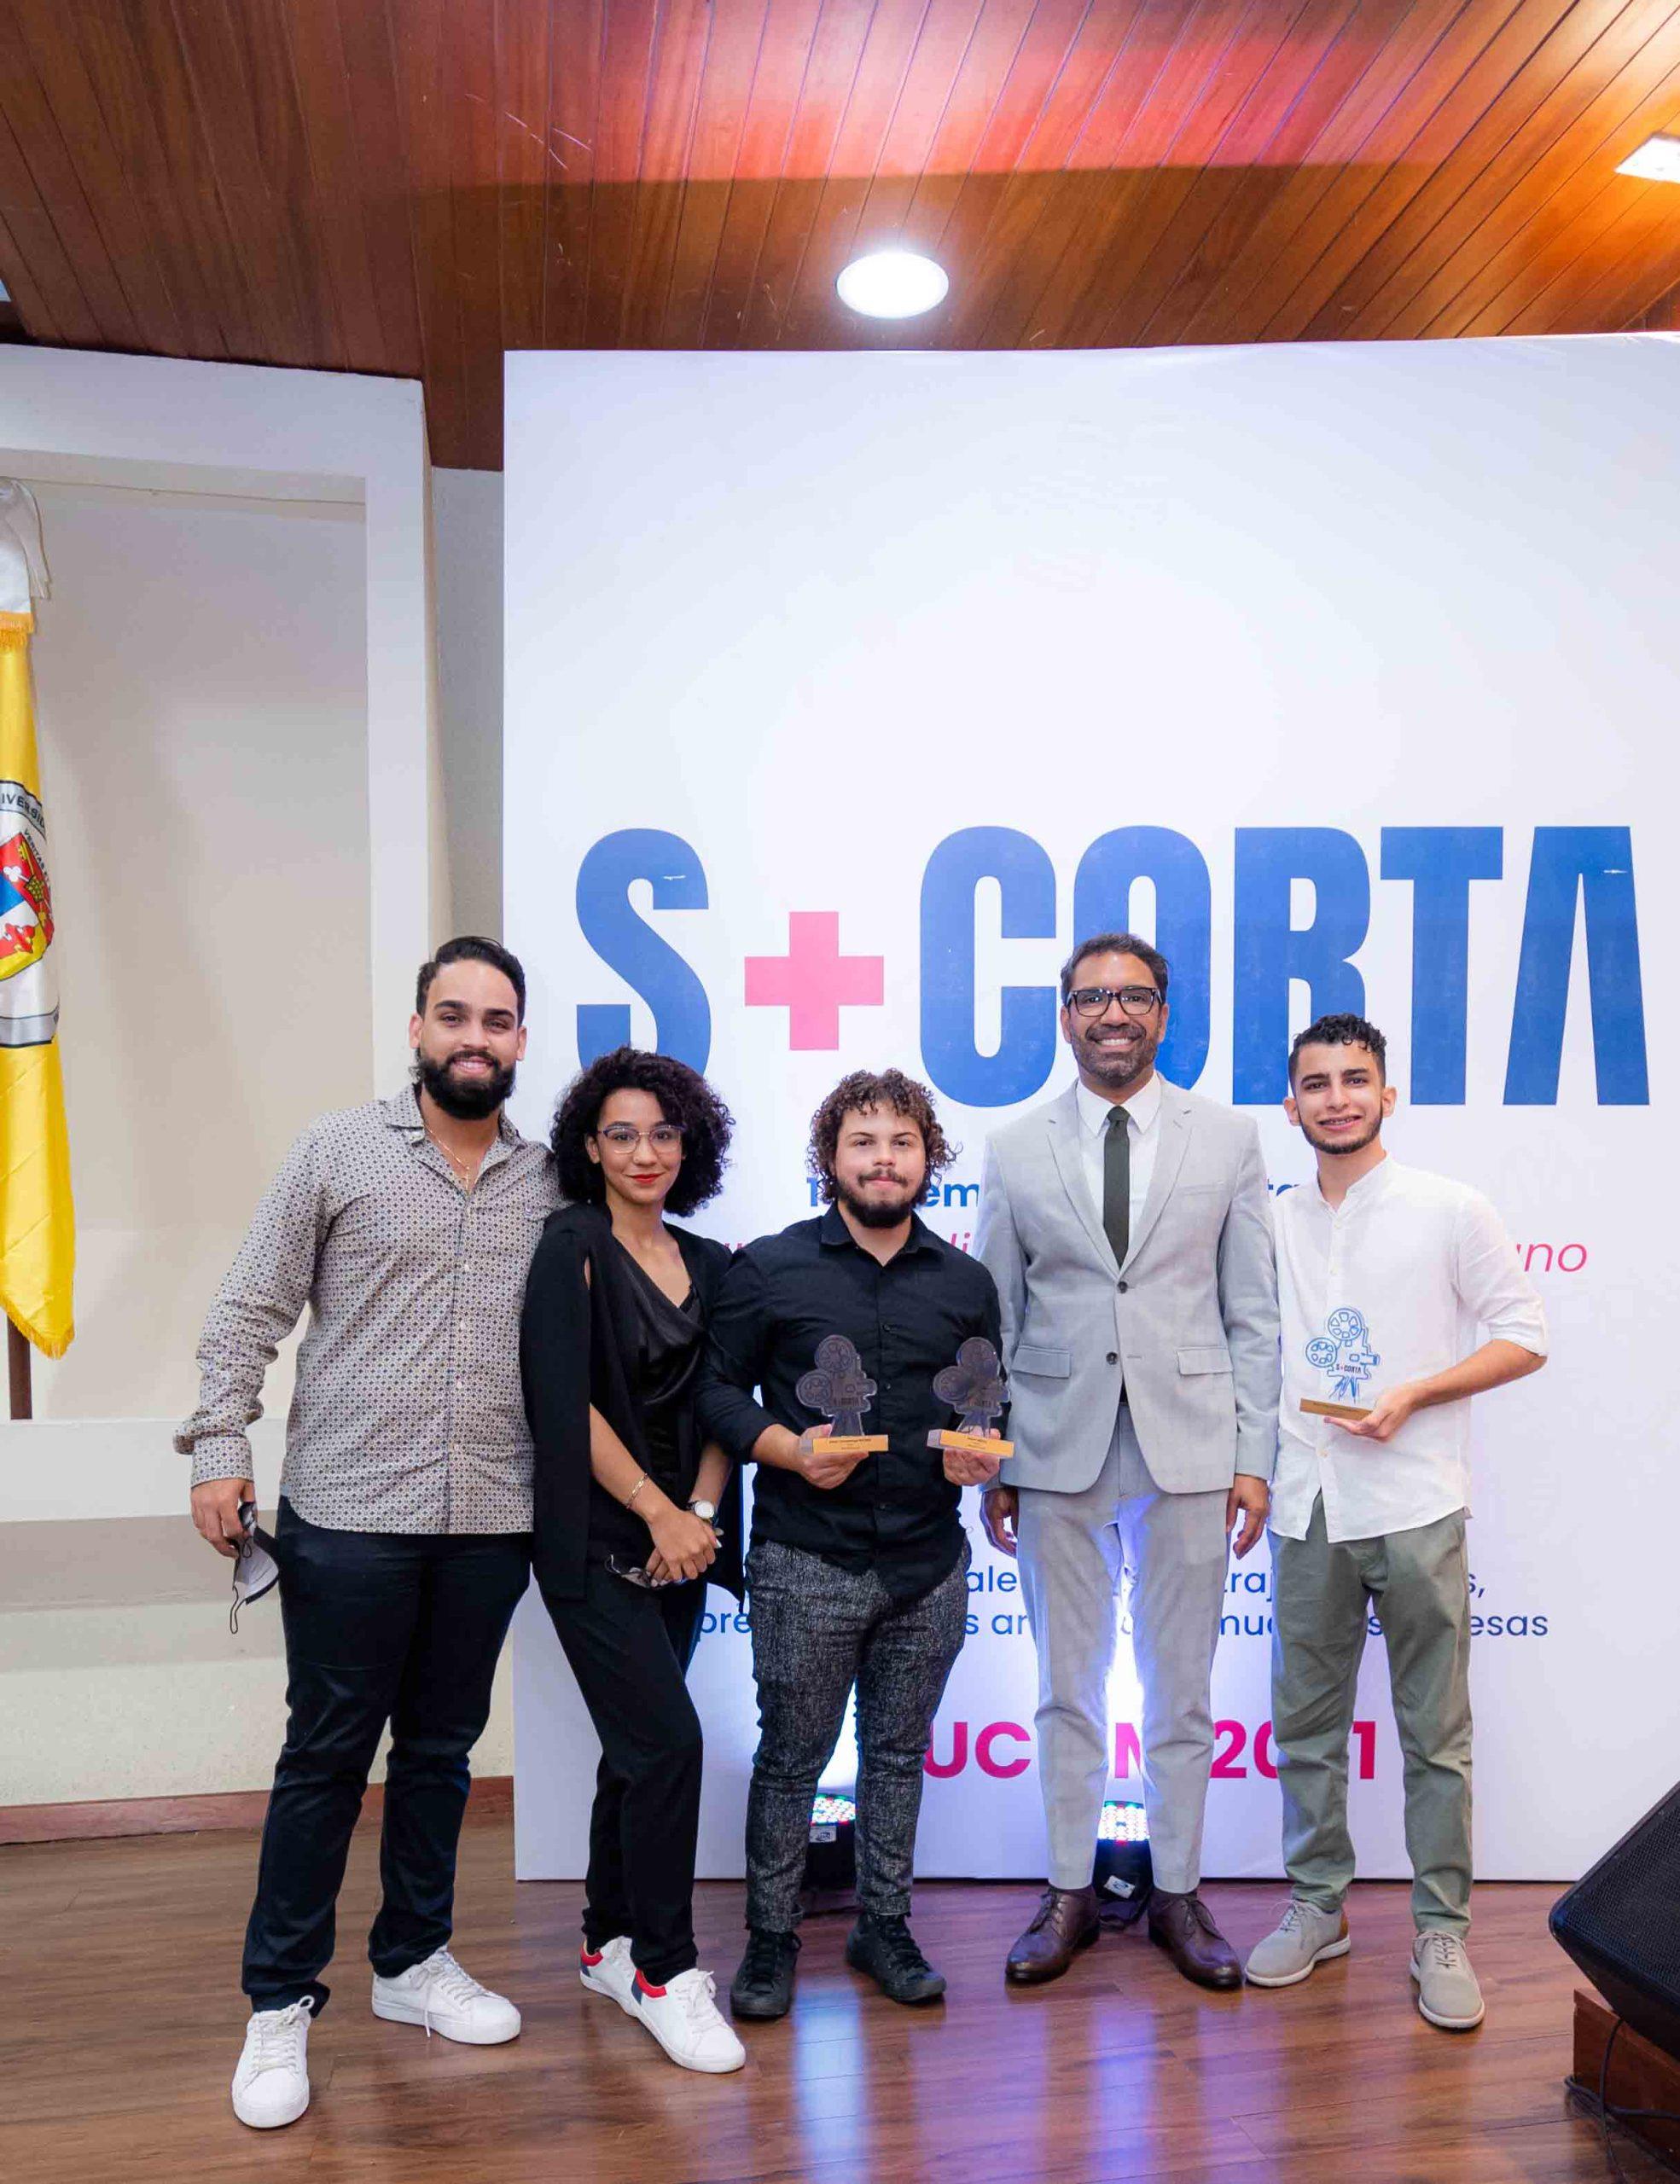 Manuel Moronta, Arlyn Suárez, Braulio Lora, Nelson Jiménez y Elian Abreu